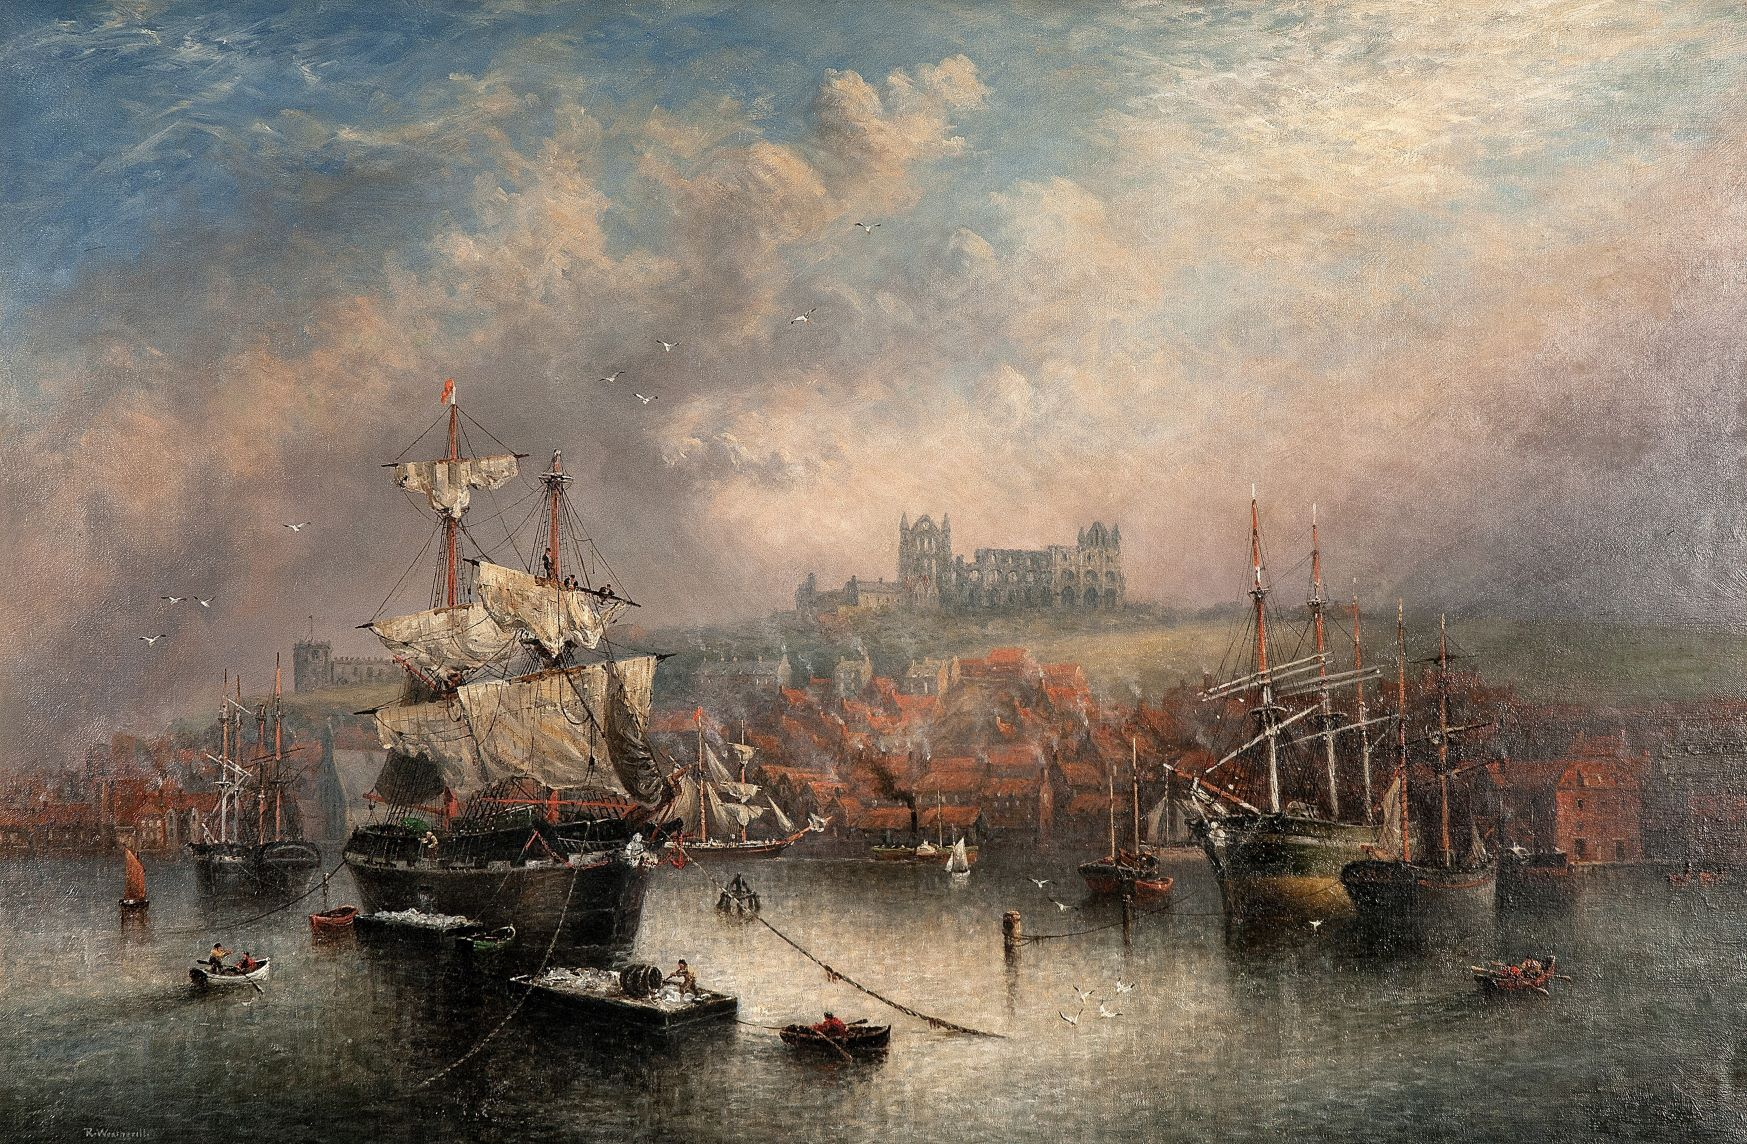 Pannett Art Gallery is Closed - Unloading Cargo by Richard Weatherill (1844 – 1923)